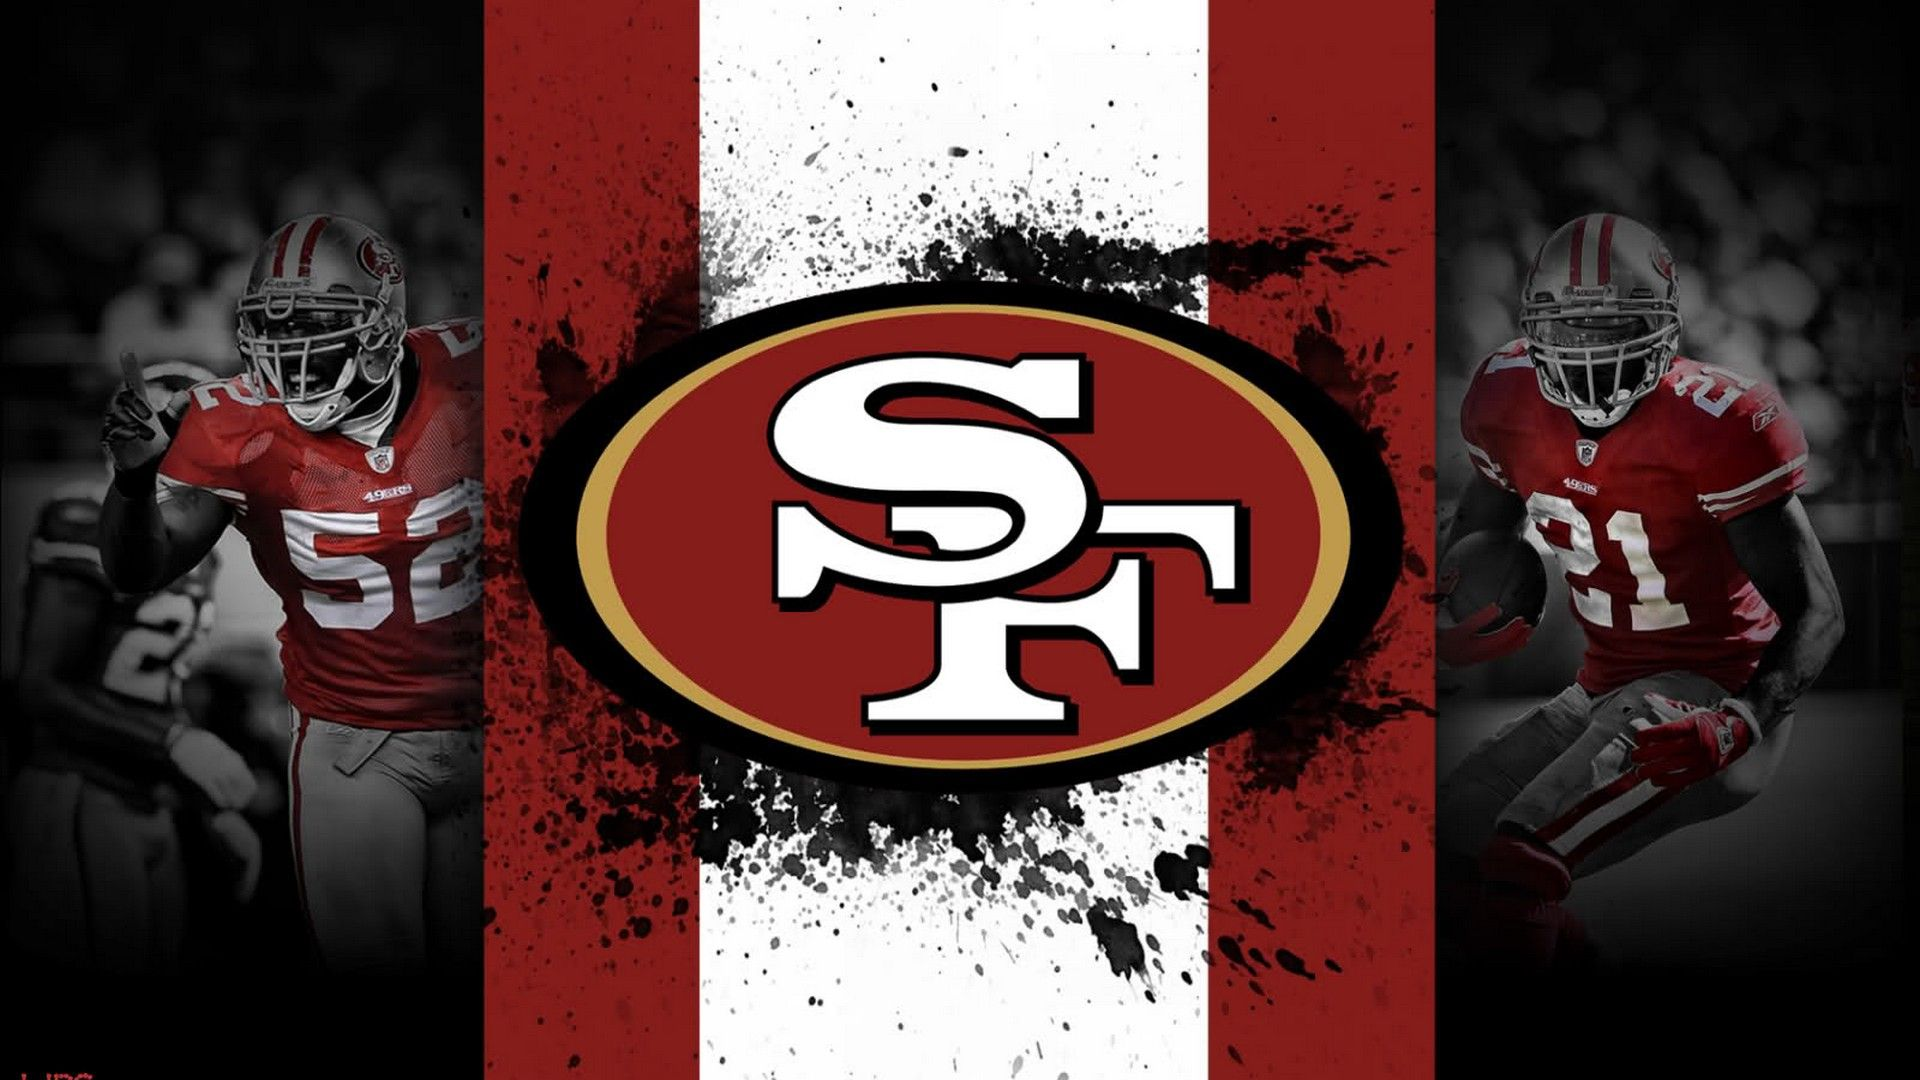 San Francisco 49ers Wallpaper Football Wallpaper San Francisco